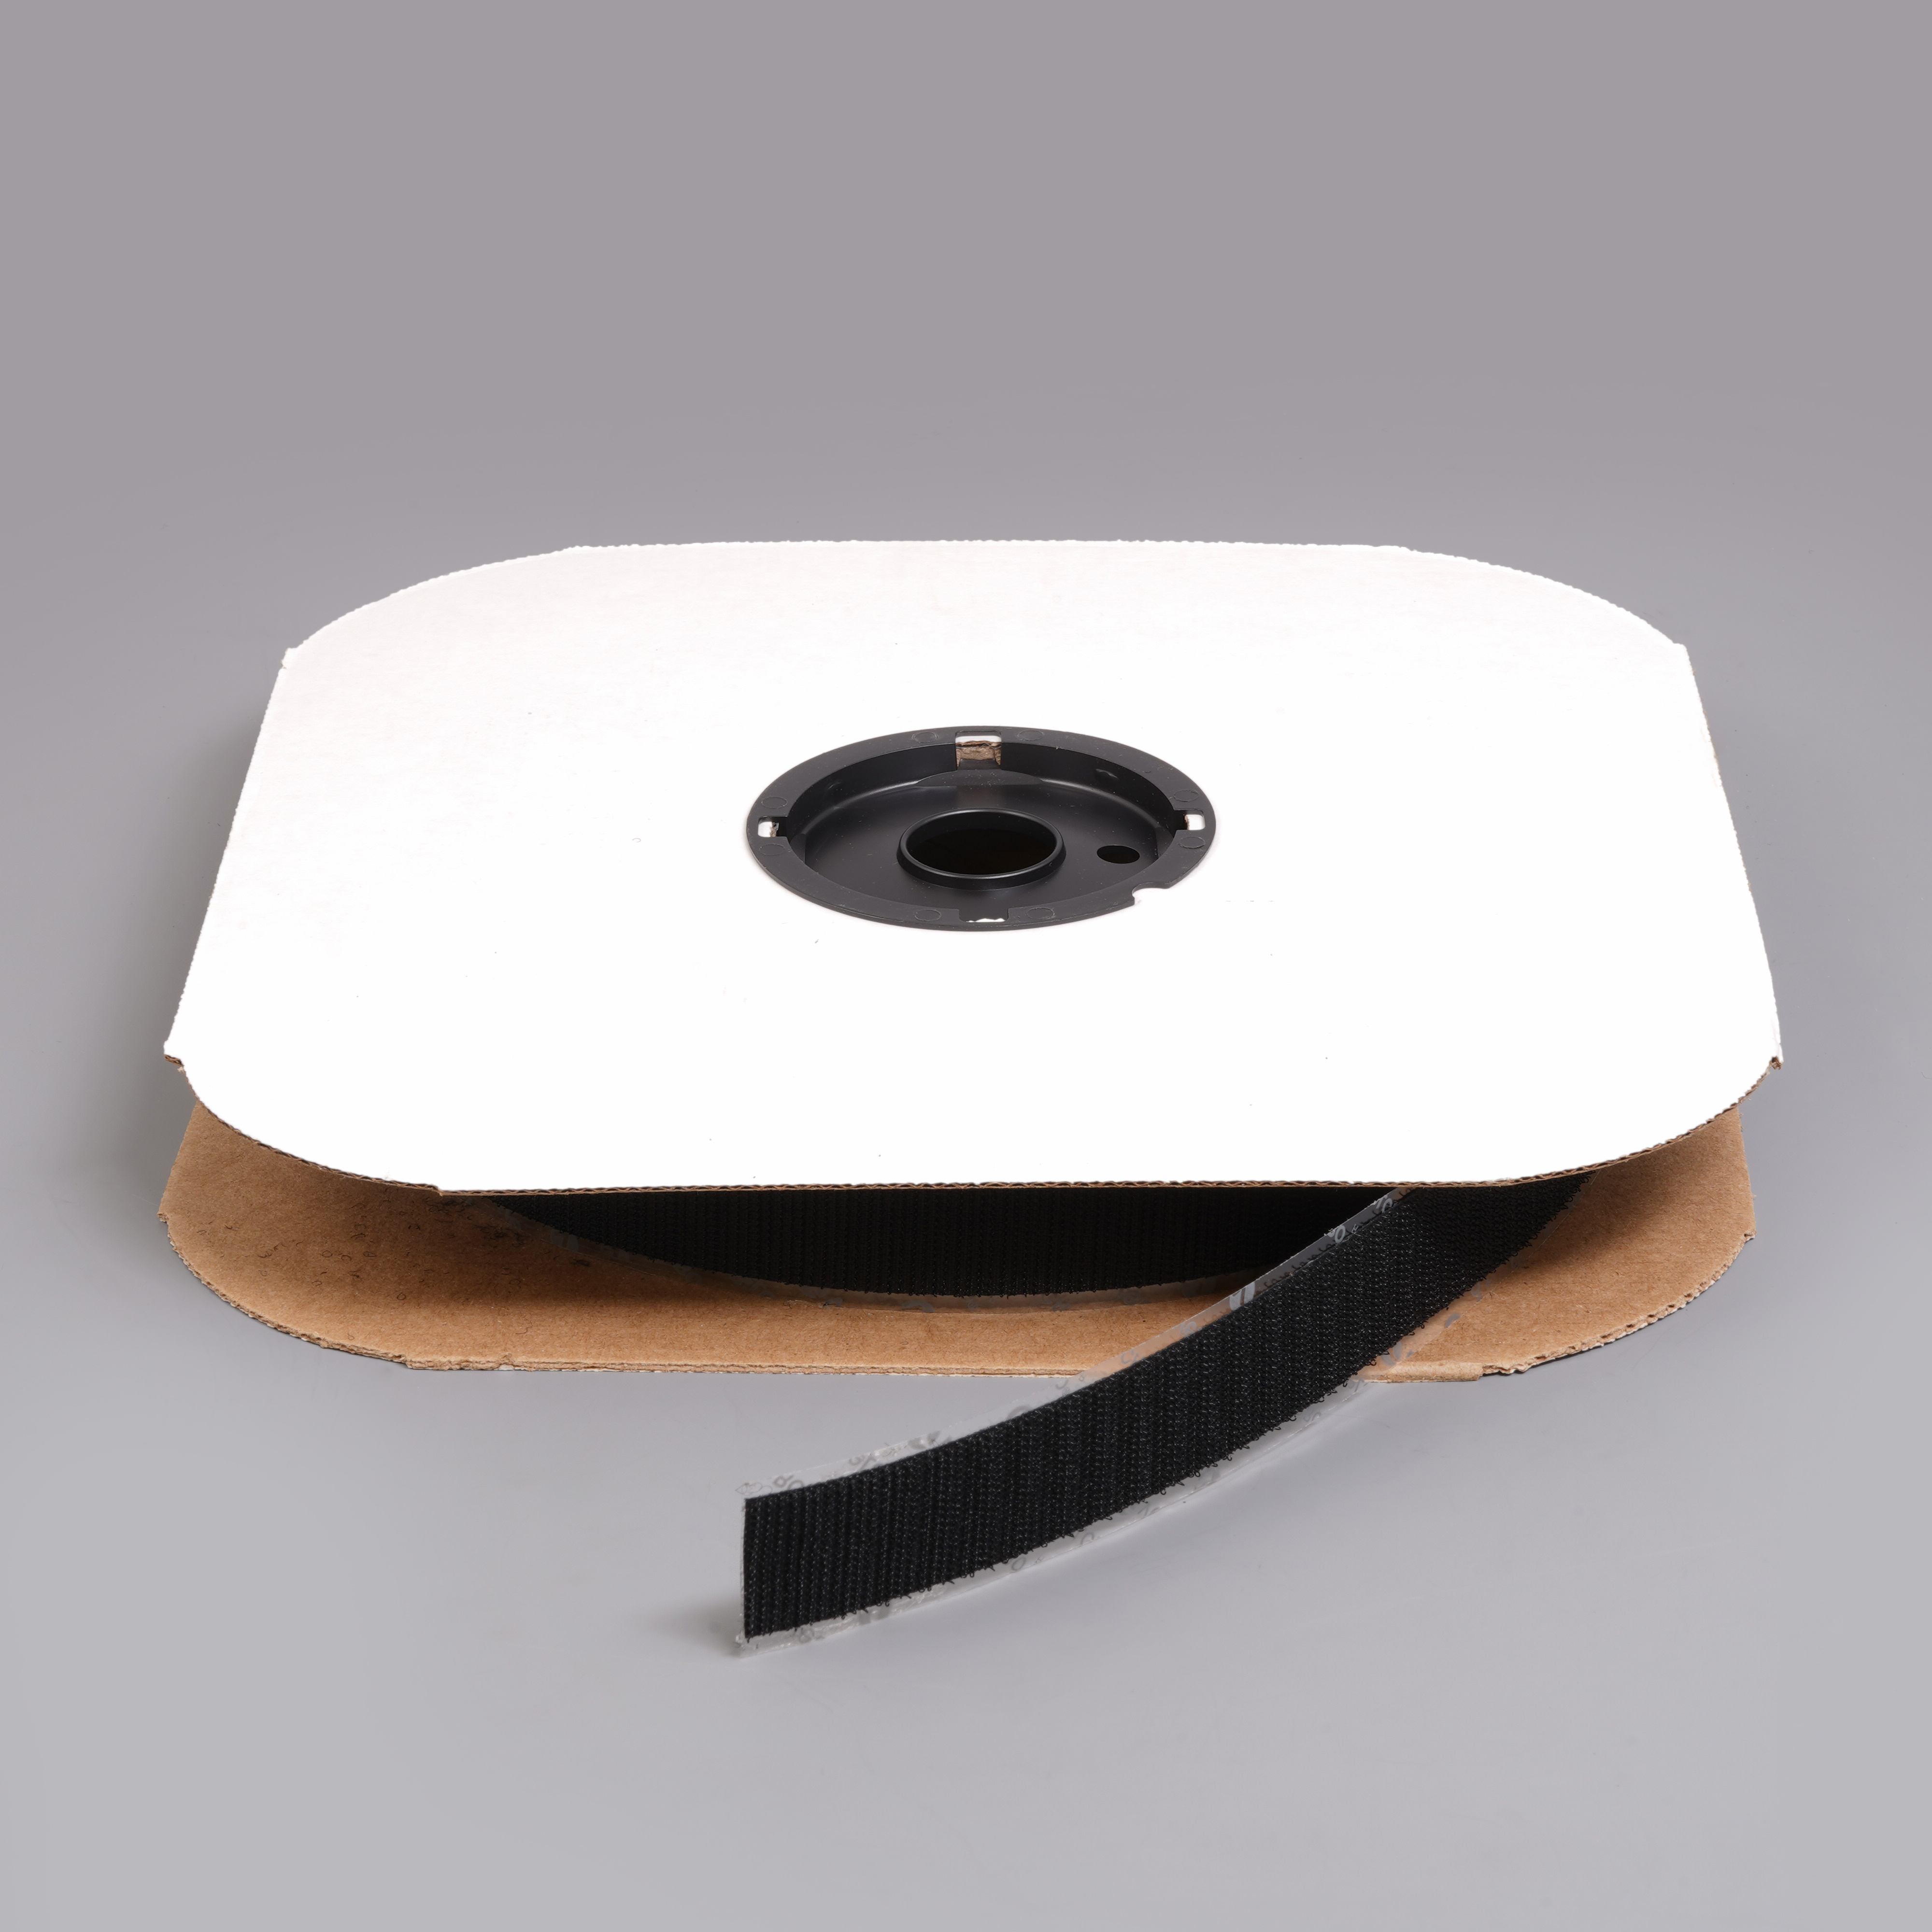 Thumbnail Image for VELCRO® Brand Nylon Tape Hook #88 Adhesive Backing